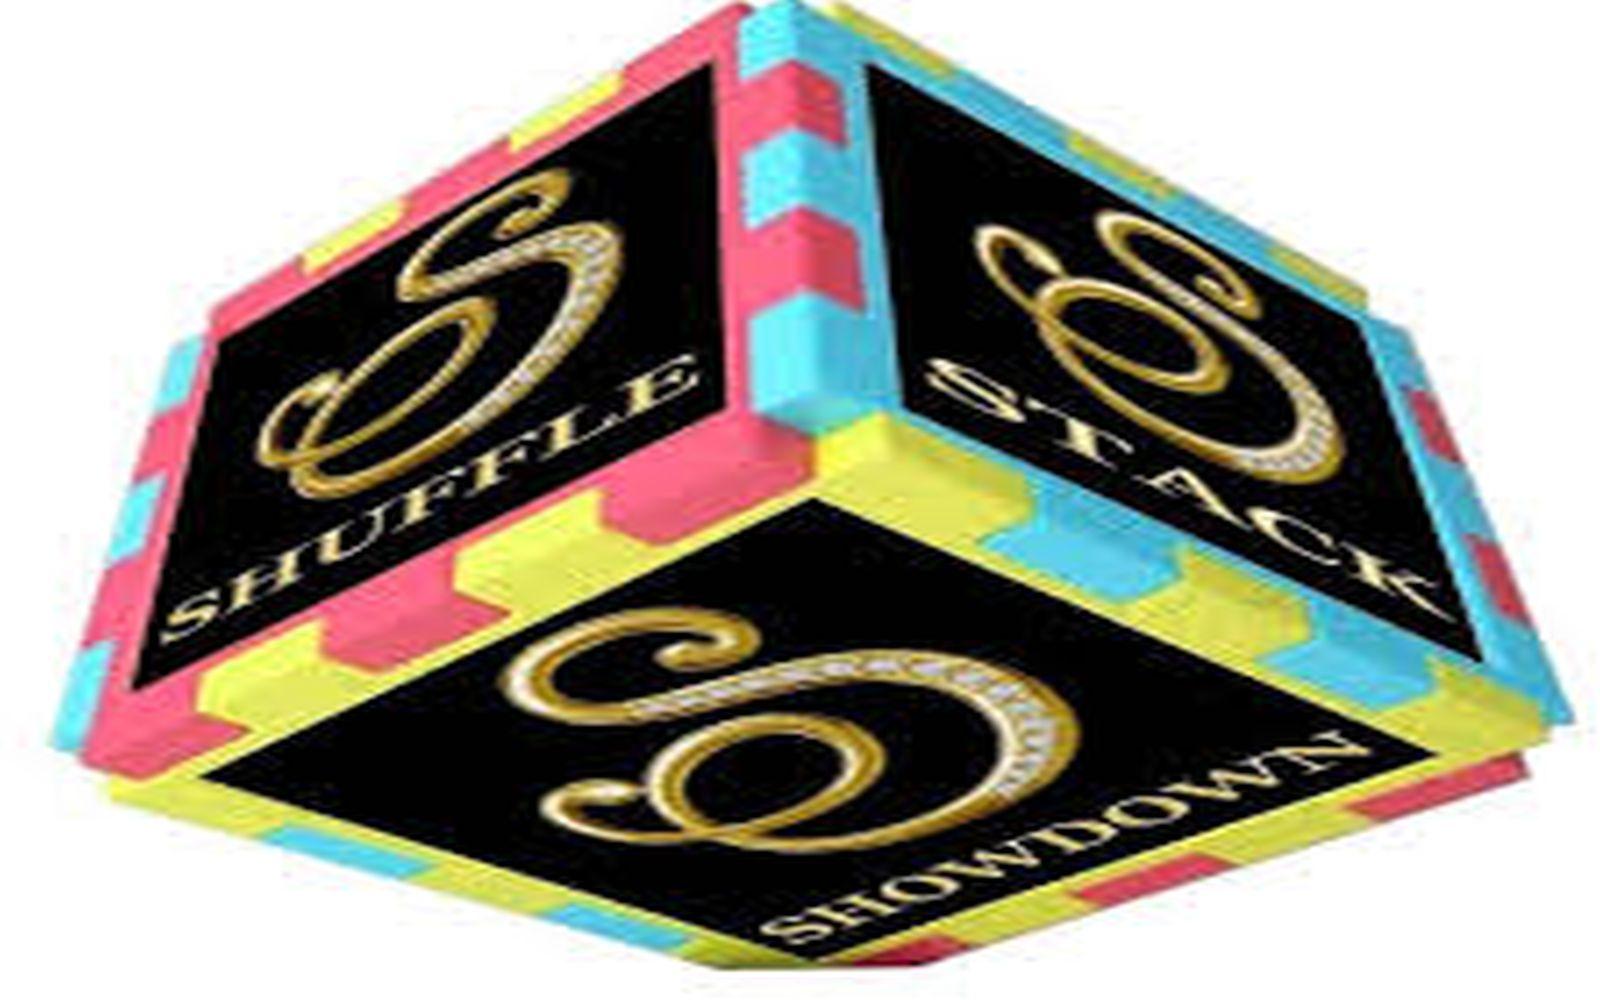 S-Cube Poker Club